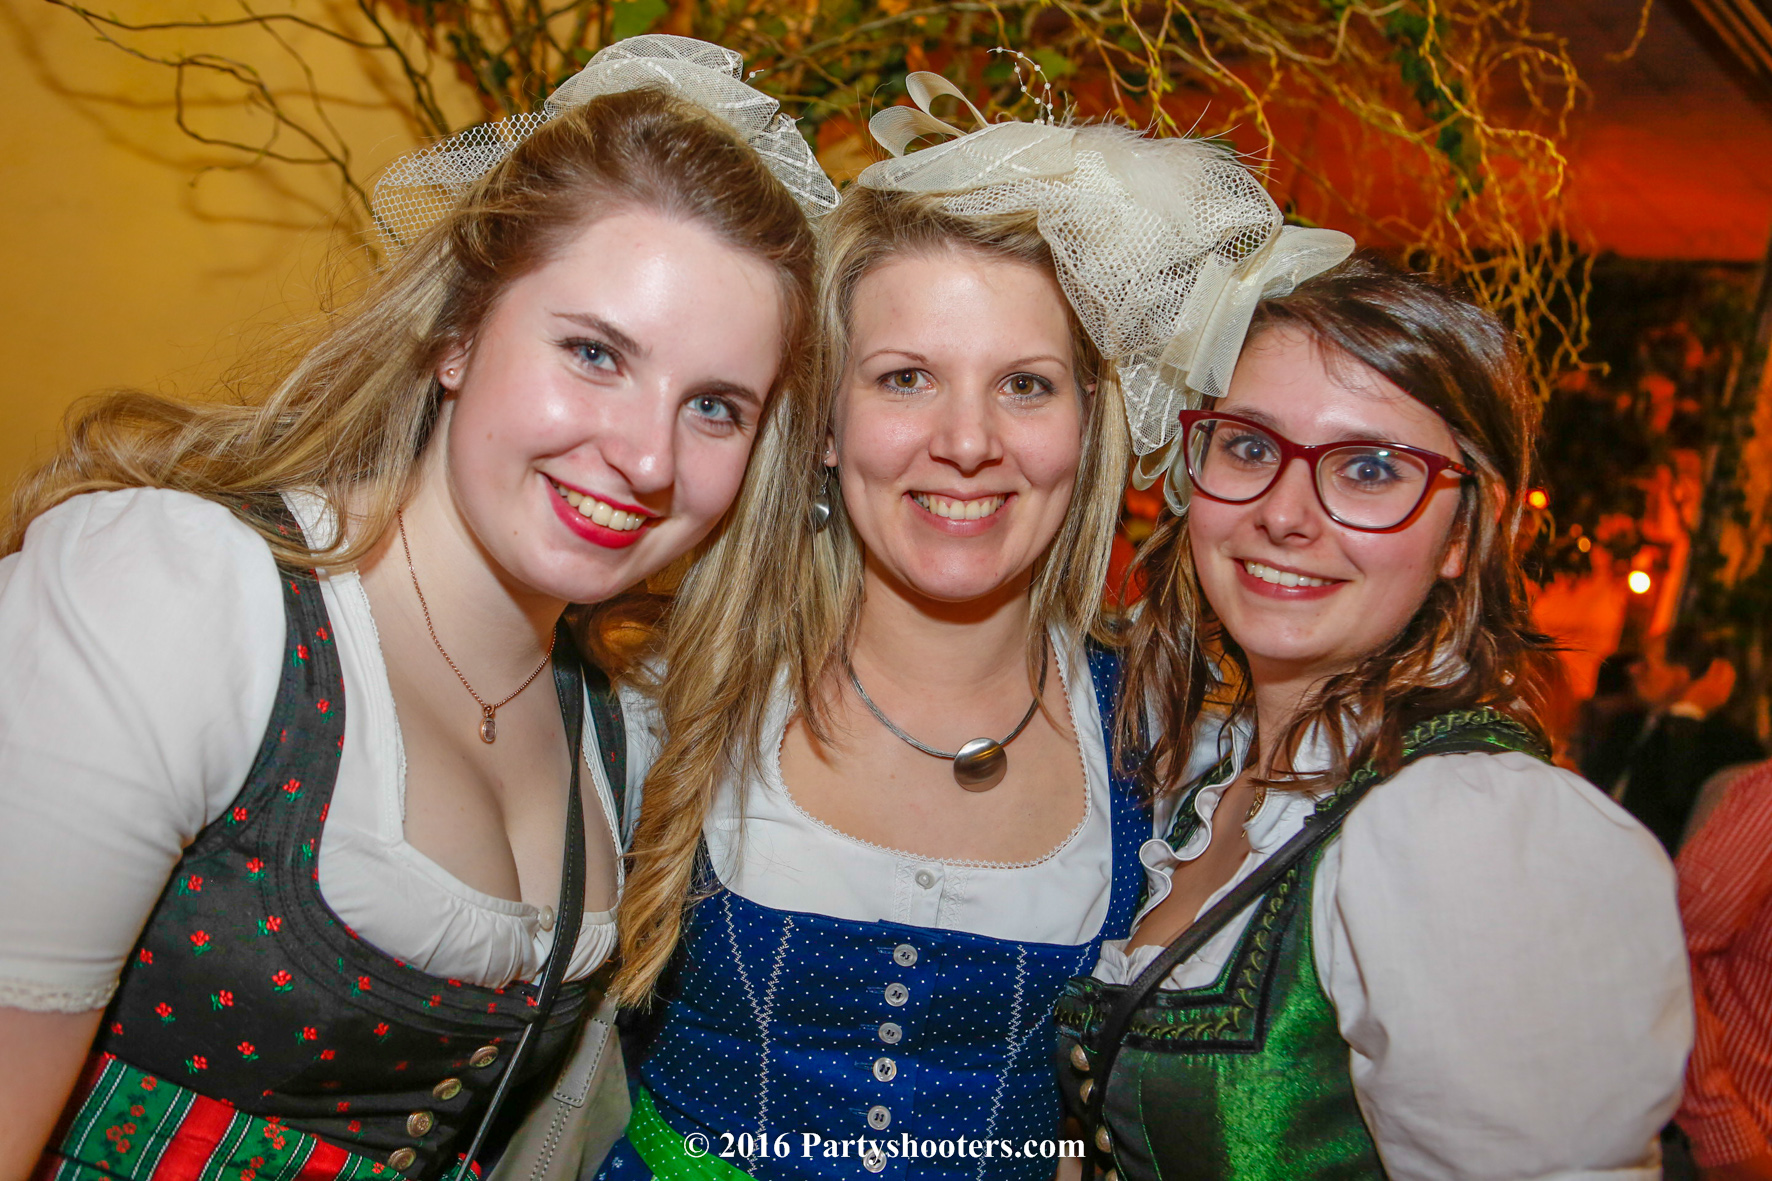 0103 - 4037 - Fruehlingsball Aspach